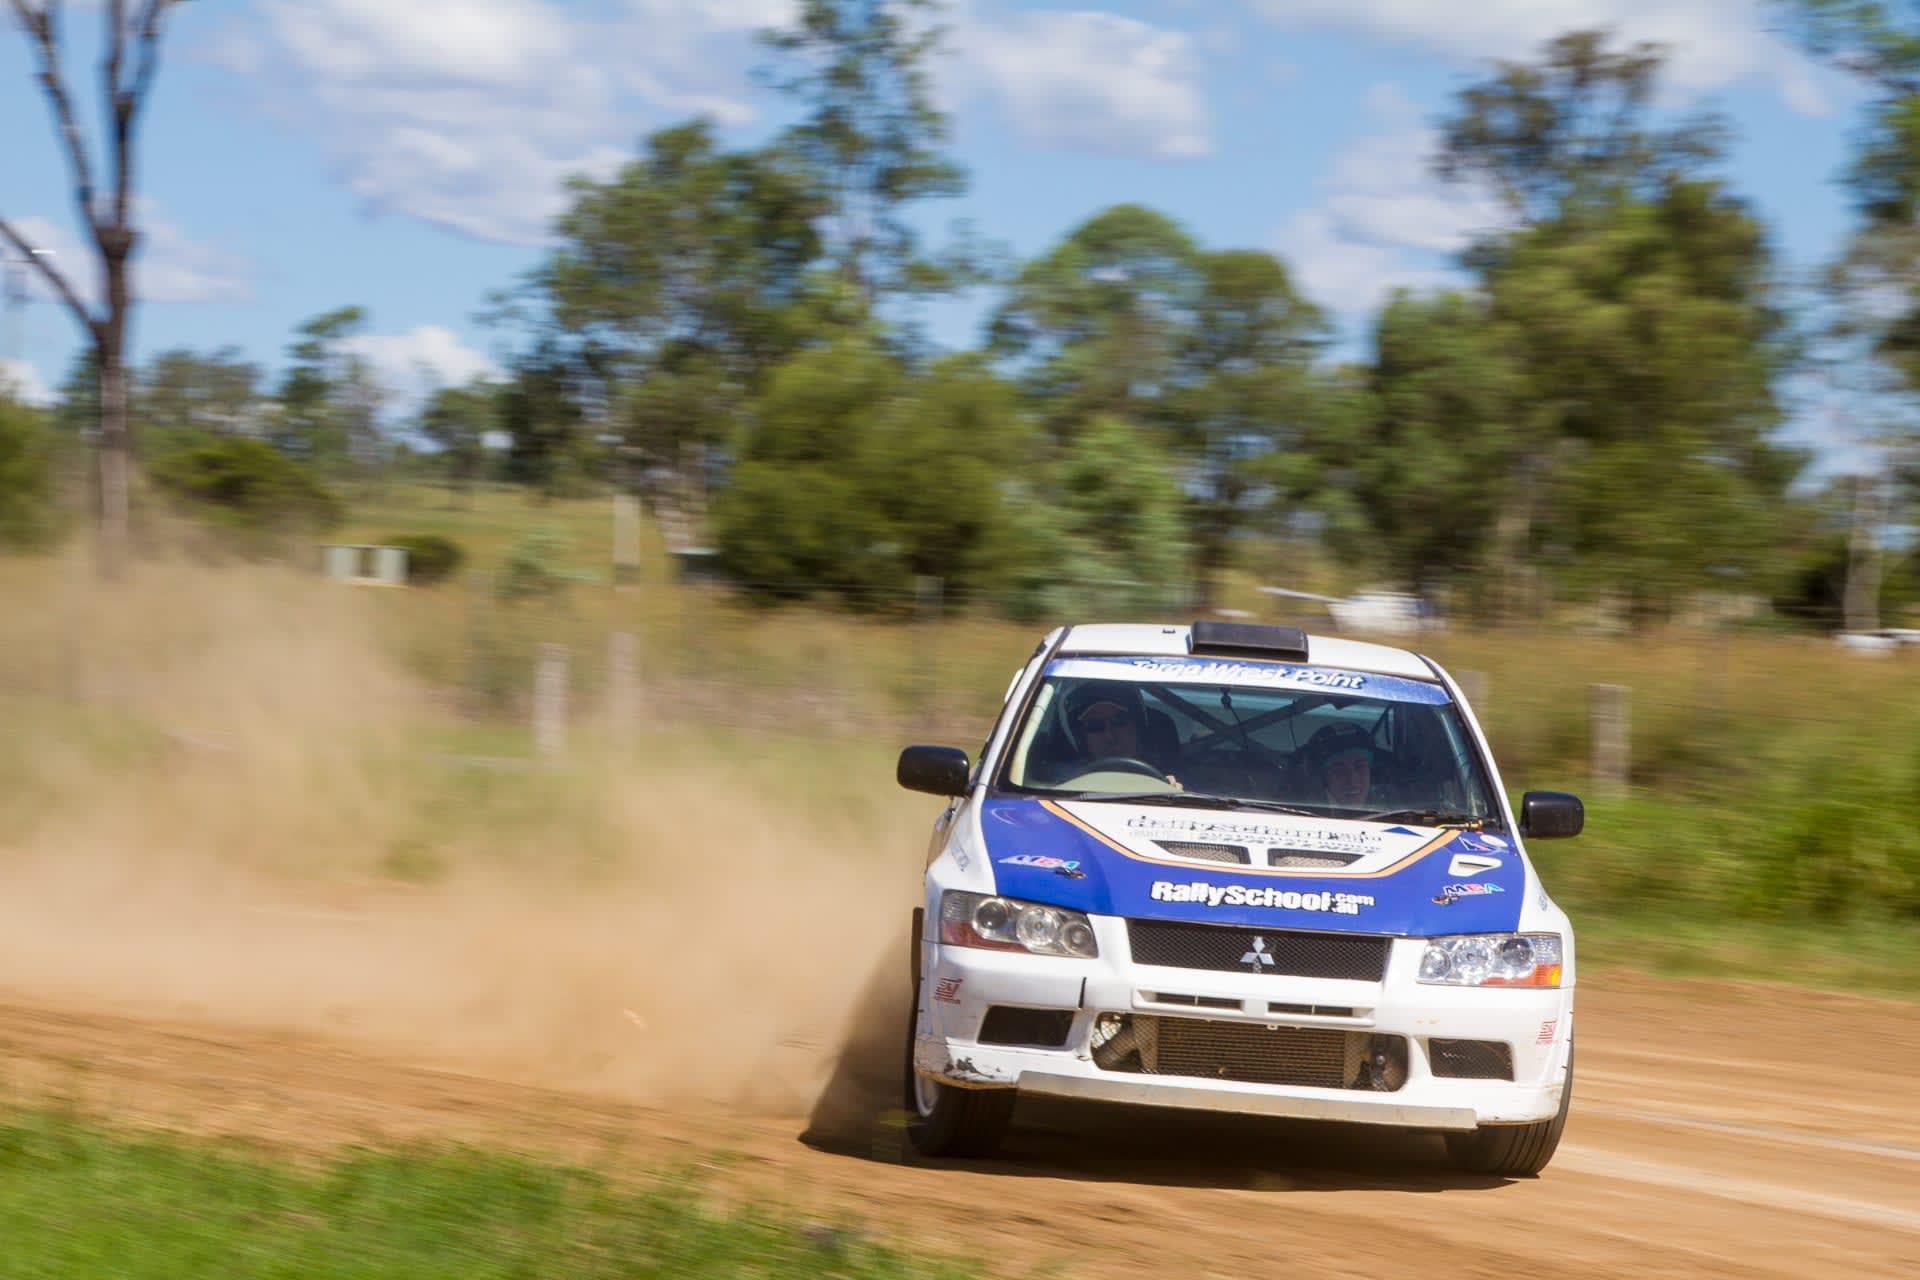 Rally Driving, 16 Lap Drive & 1 Hot Lap, Drive 2 Cars - Hunter Valley